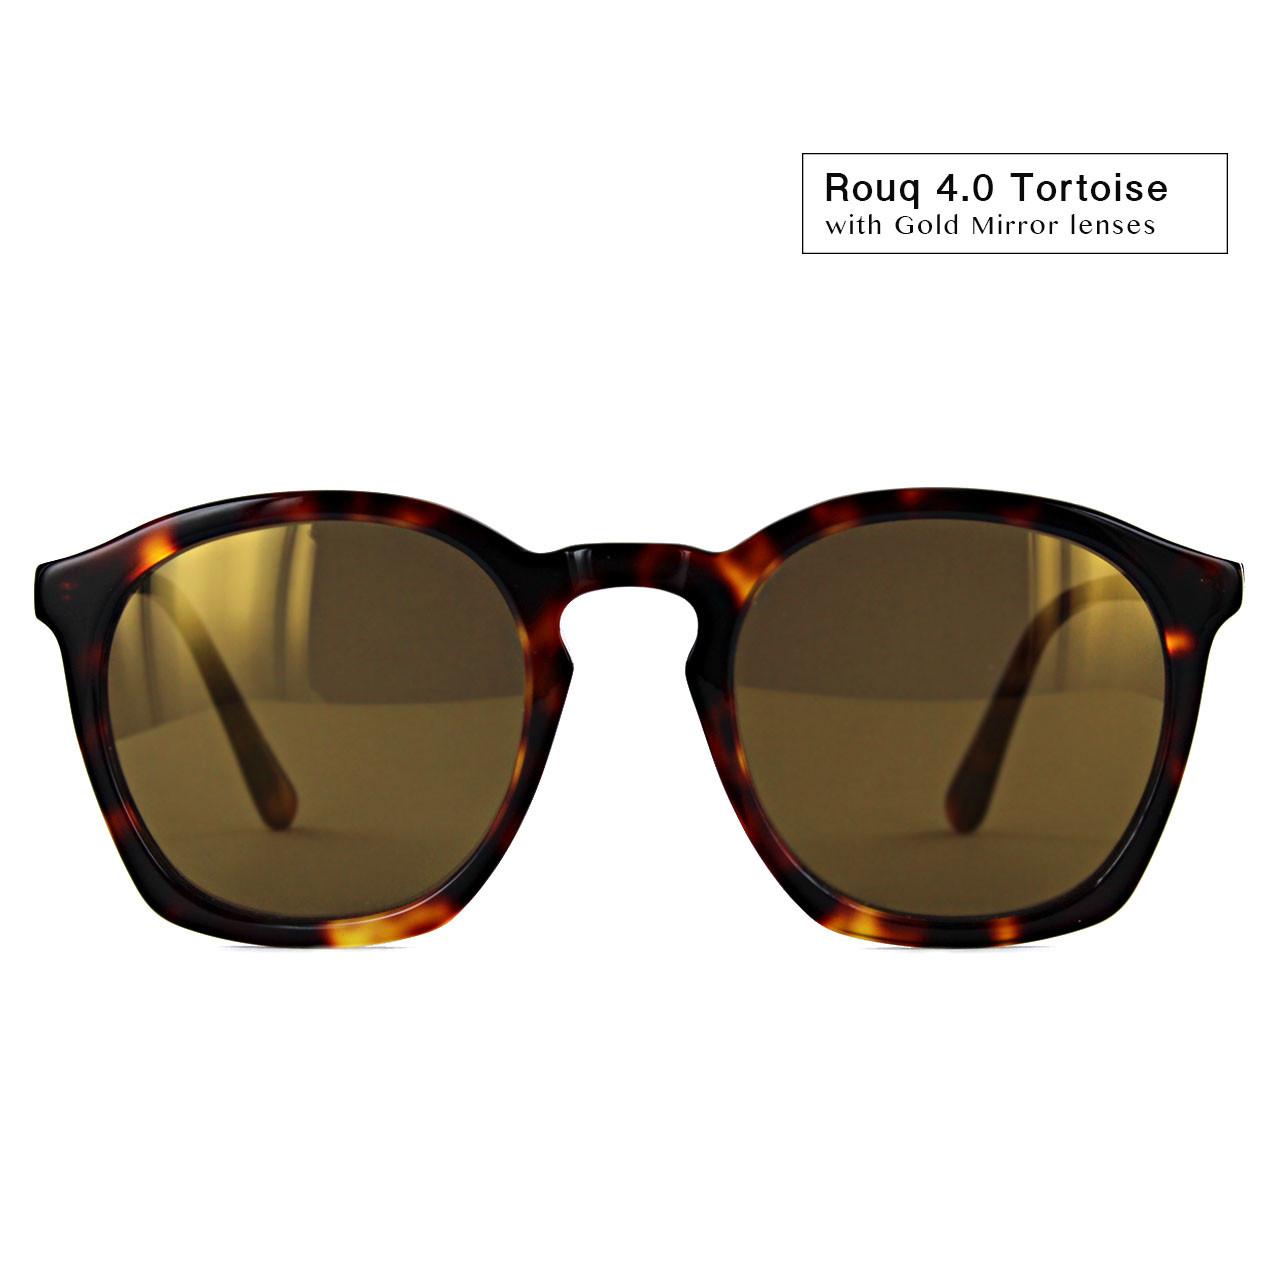 Rouq 4.0 Tortoise with Gold Mirror Lenses